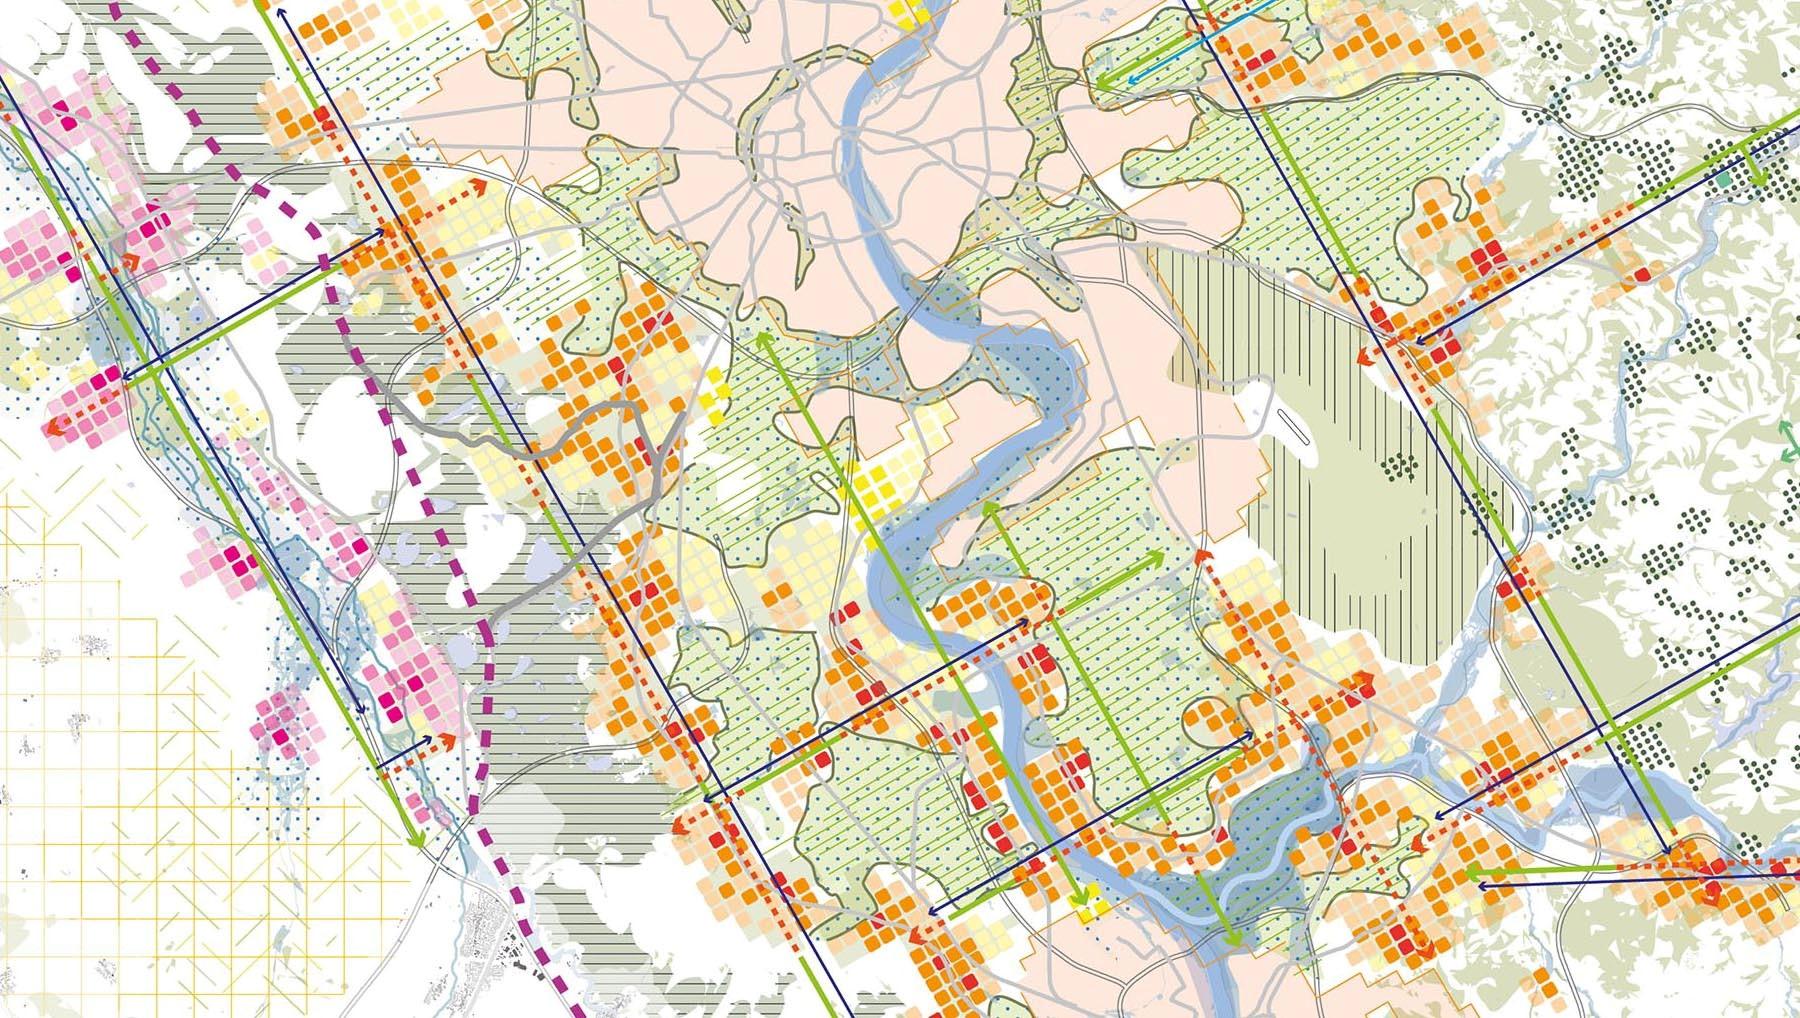 Afbeelding kaart behorend bij Agglomeratieconcept Keulen / Bonn